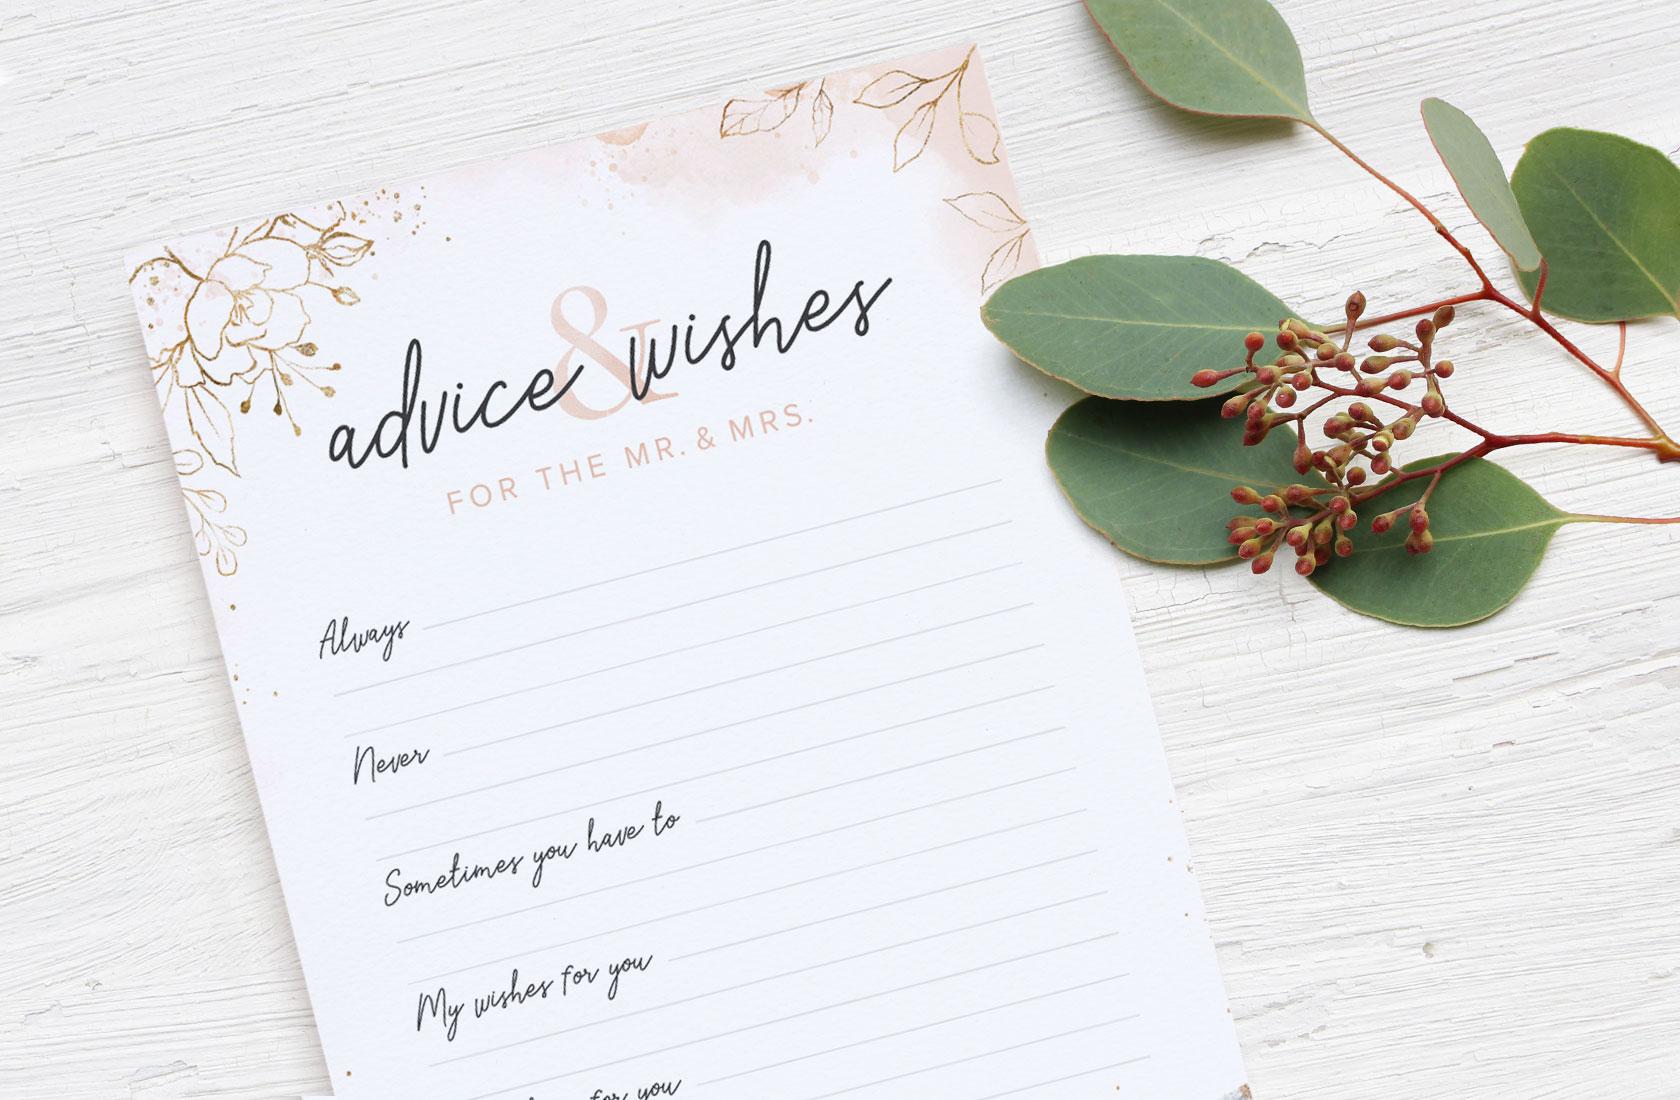 57 Free Bridal Shower Printables To Celebrate The Bride Zola Expert Wedding Advice